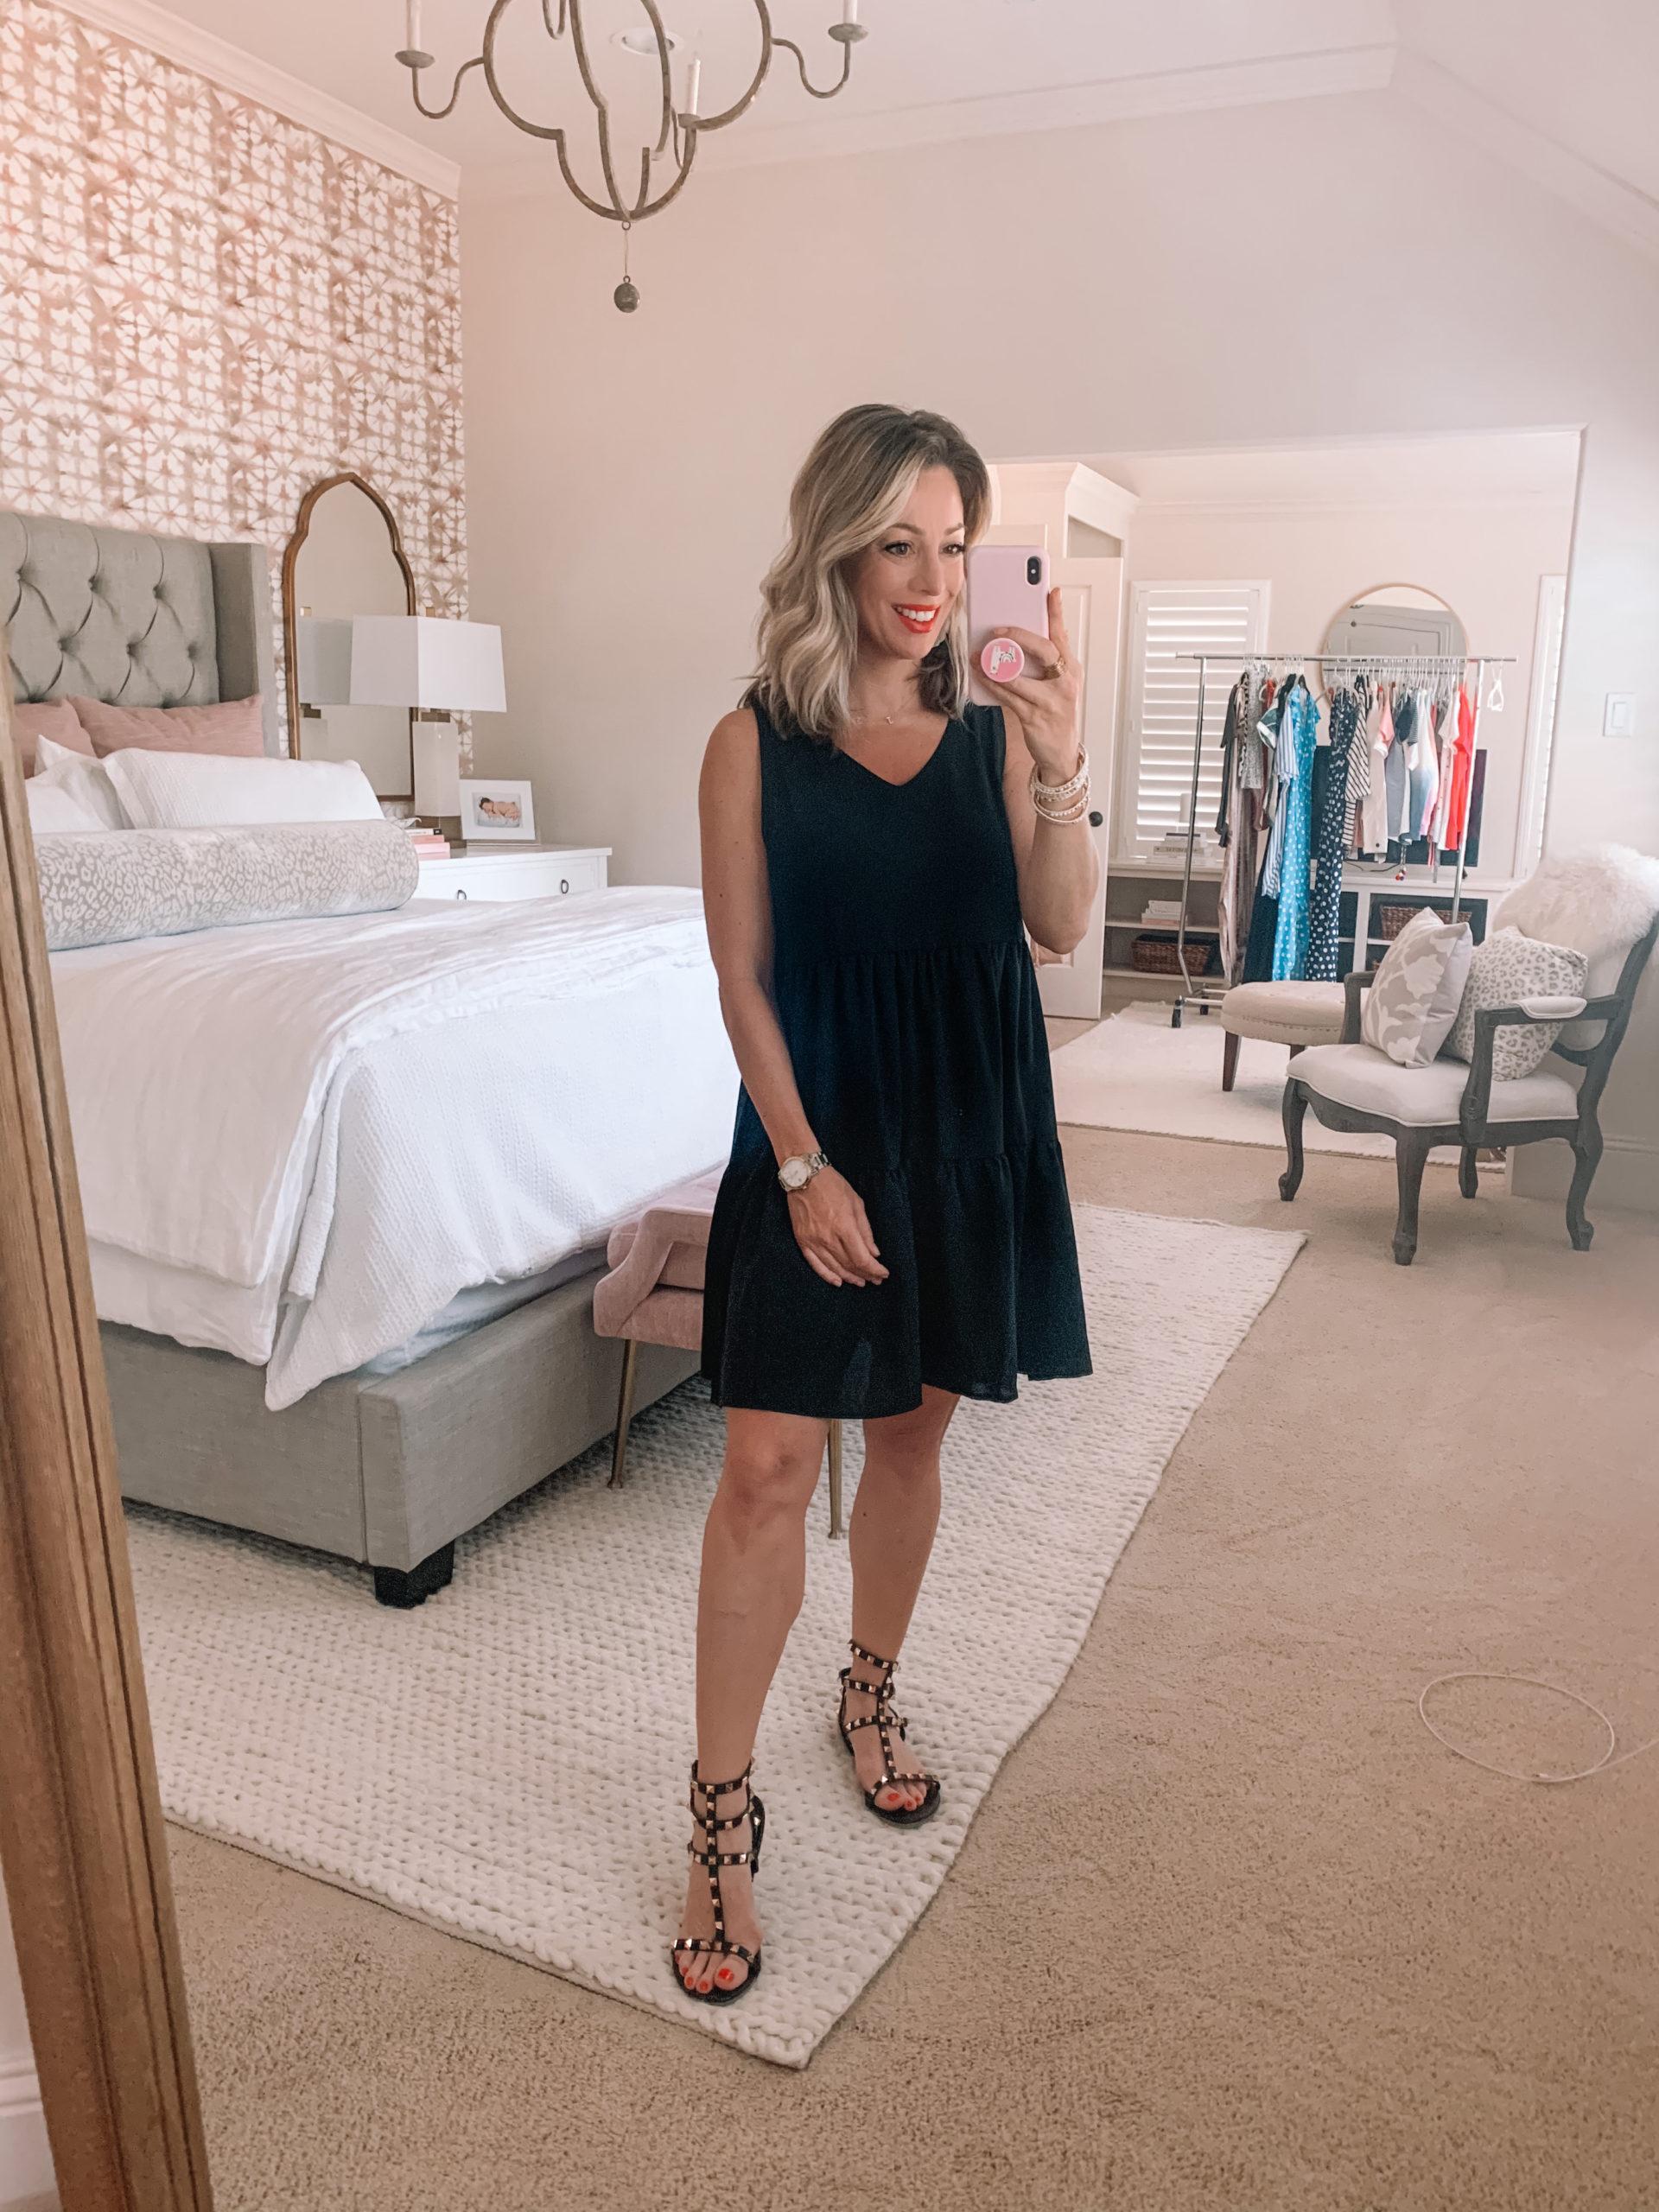 Amazon Fashion - Black V-Neck Shift Dress, Studded Sandals